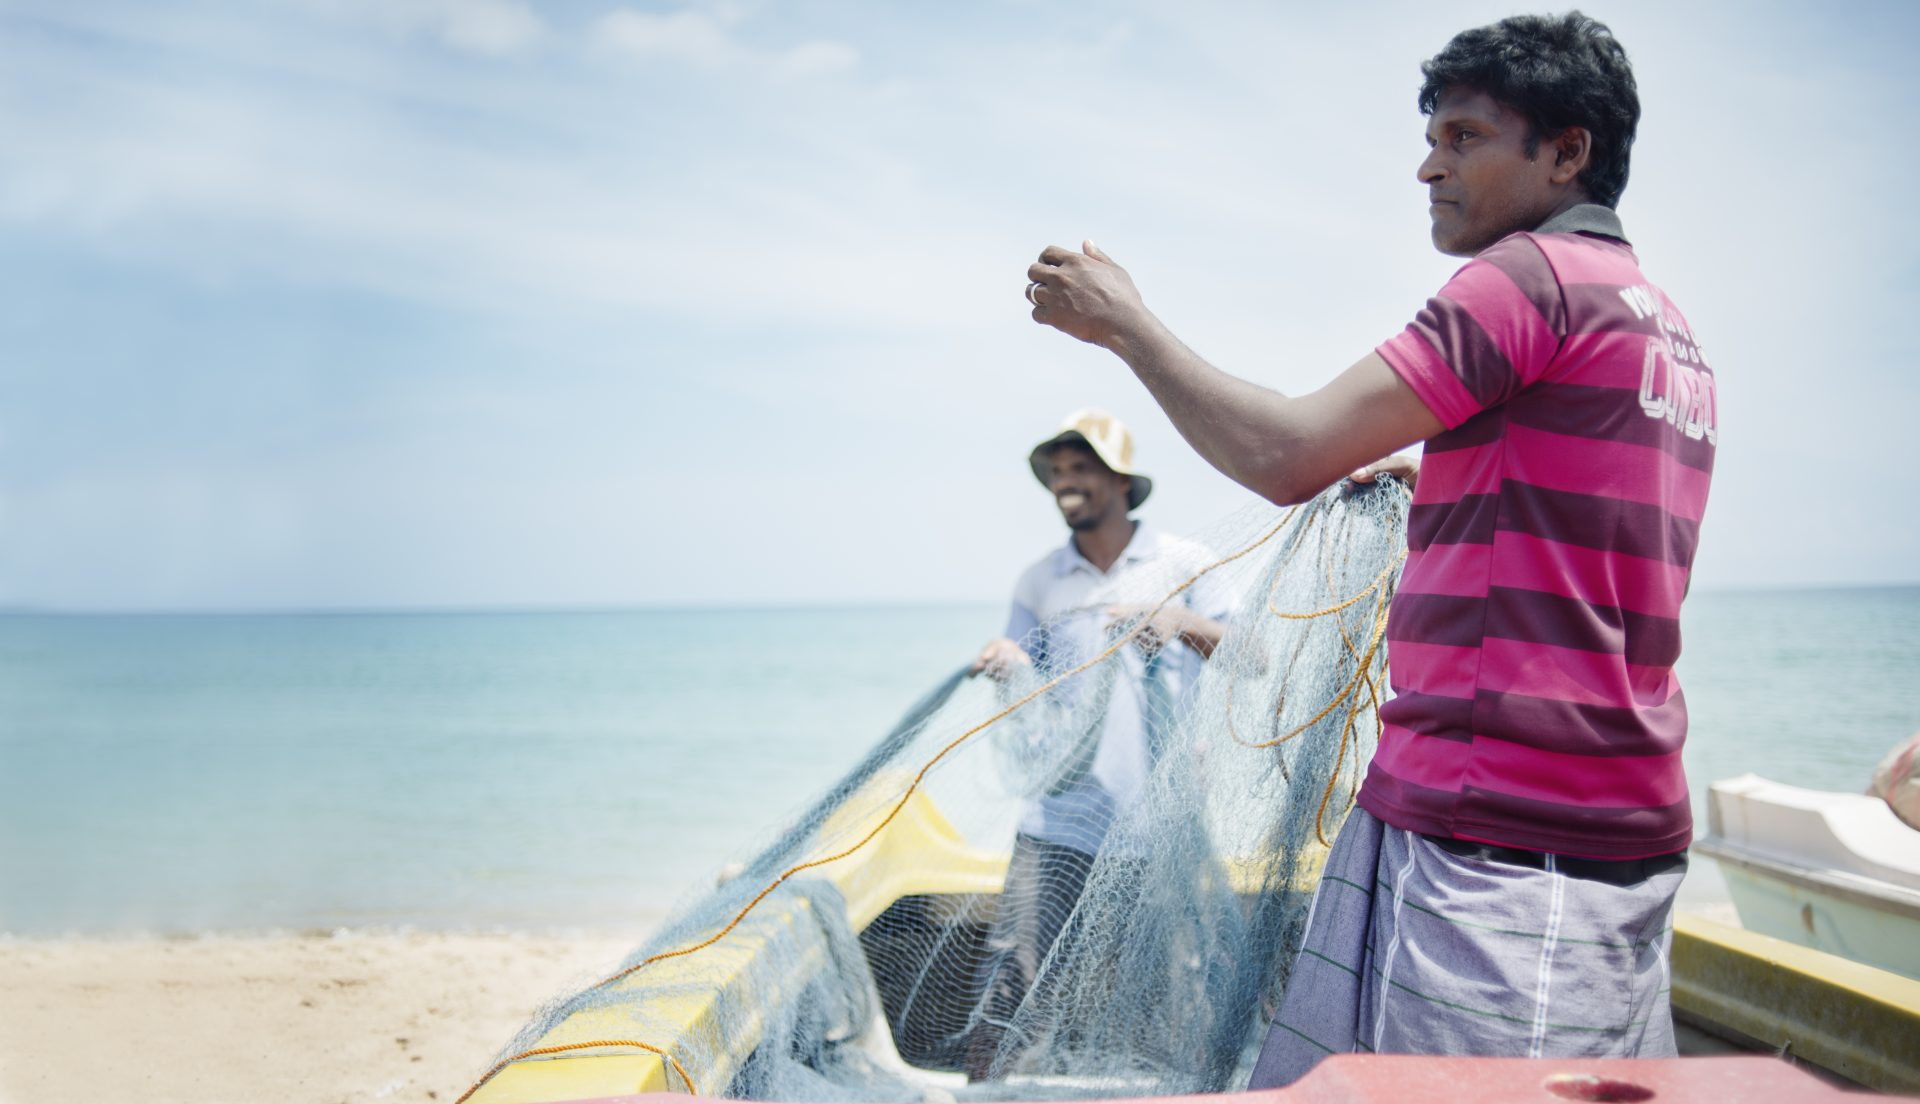 Fiskeren Peter ved Sri Lankas østkyst -Foto: Sara Kollberg